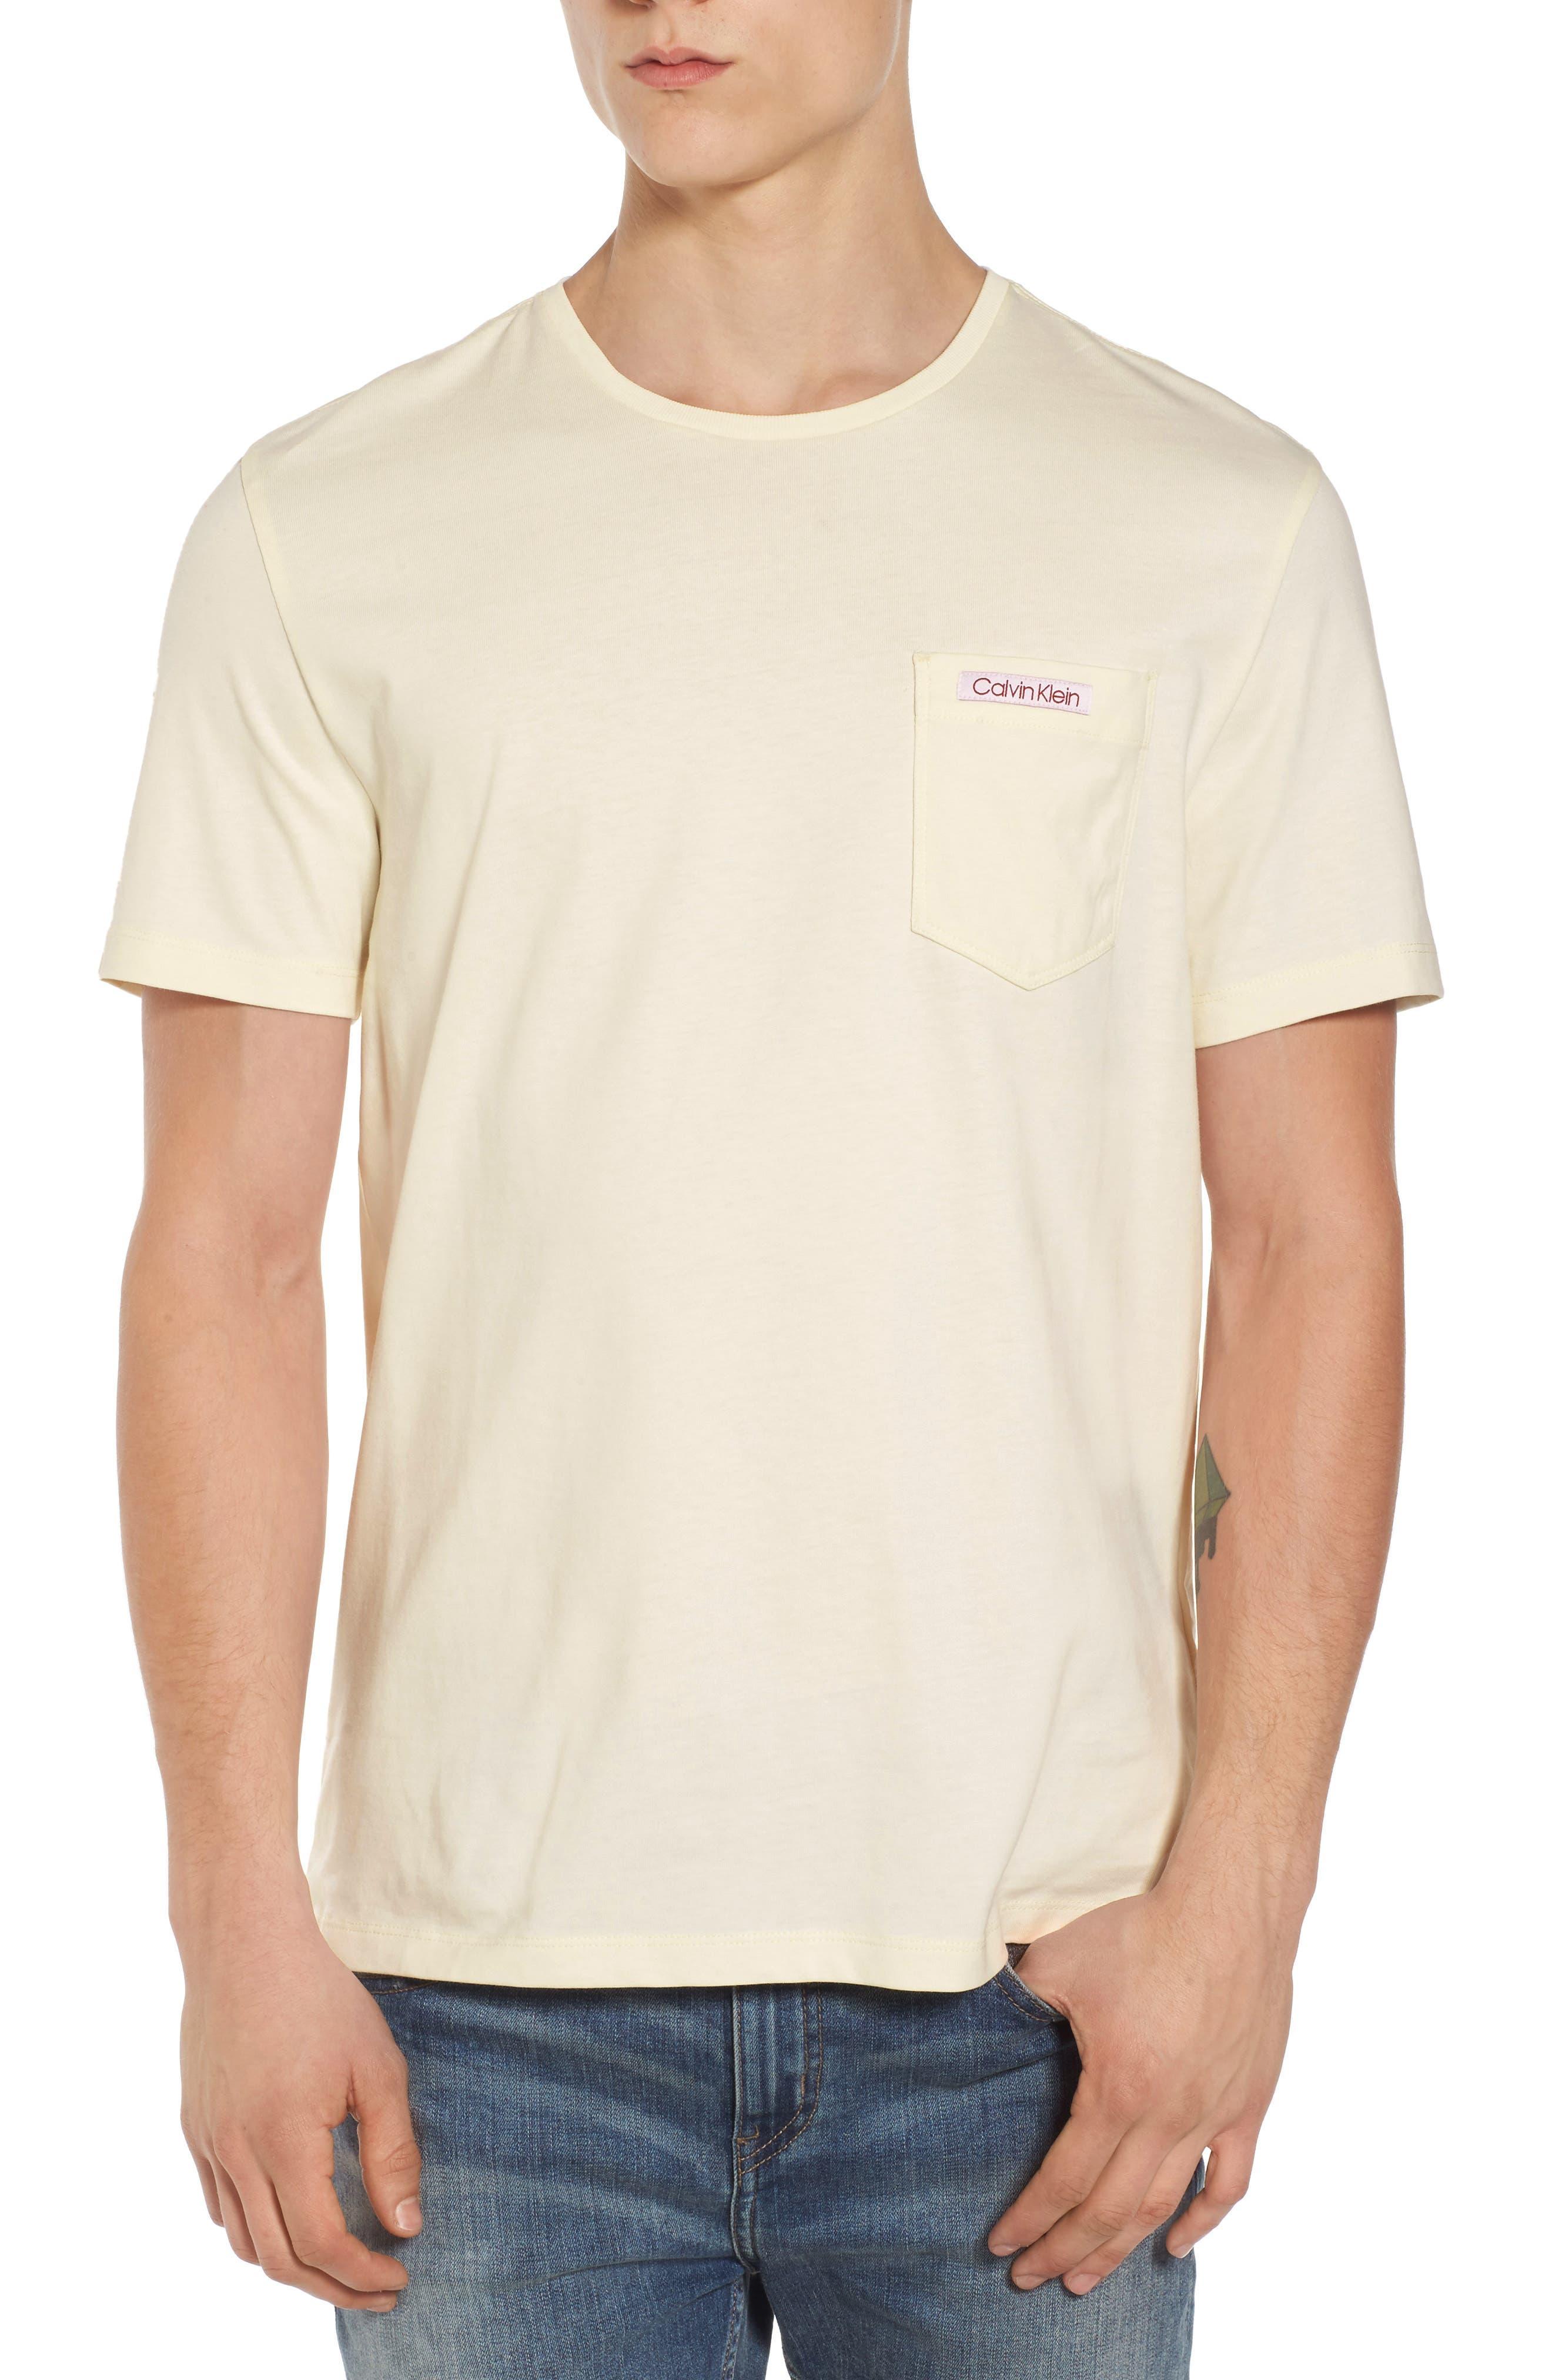 Alternate Image 1 Selected - Calvin Klein Jeans Label Pocket T-Shirt